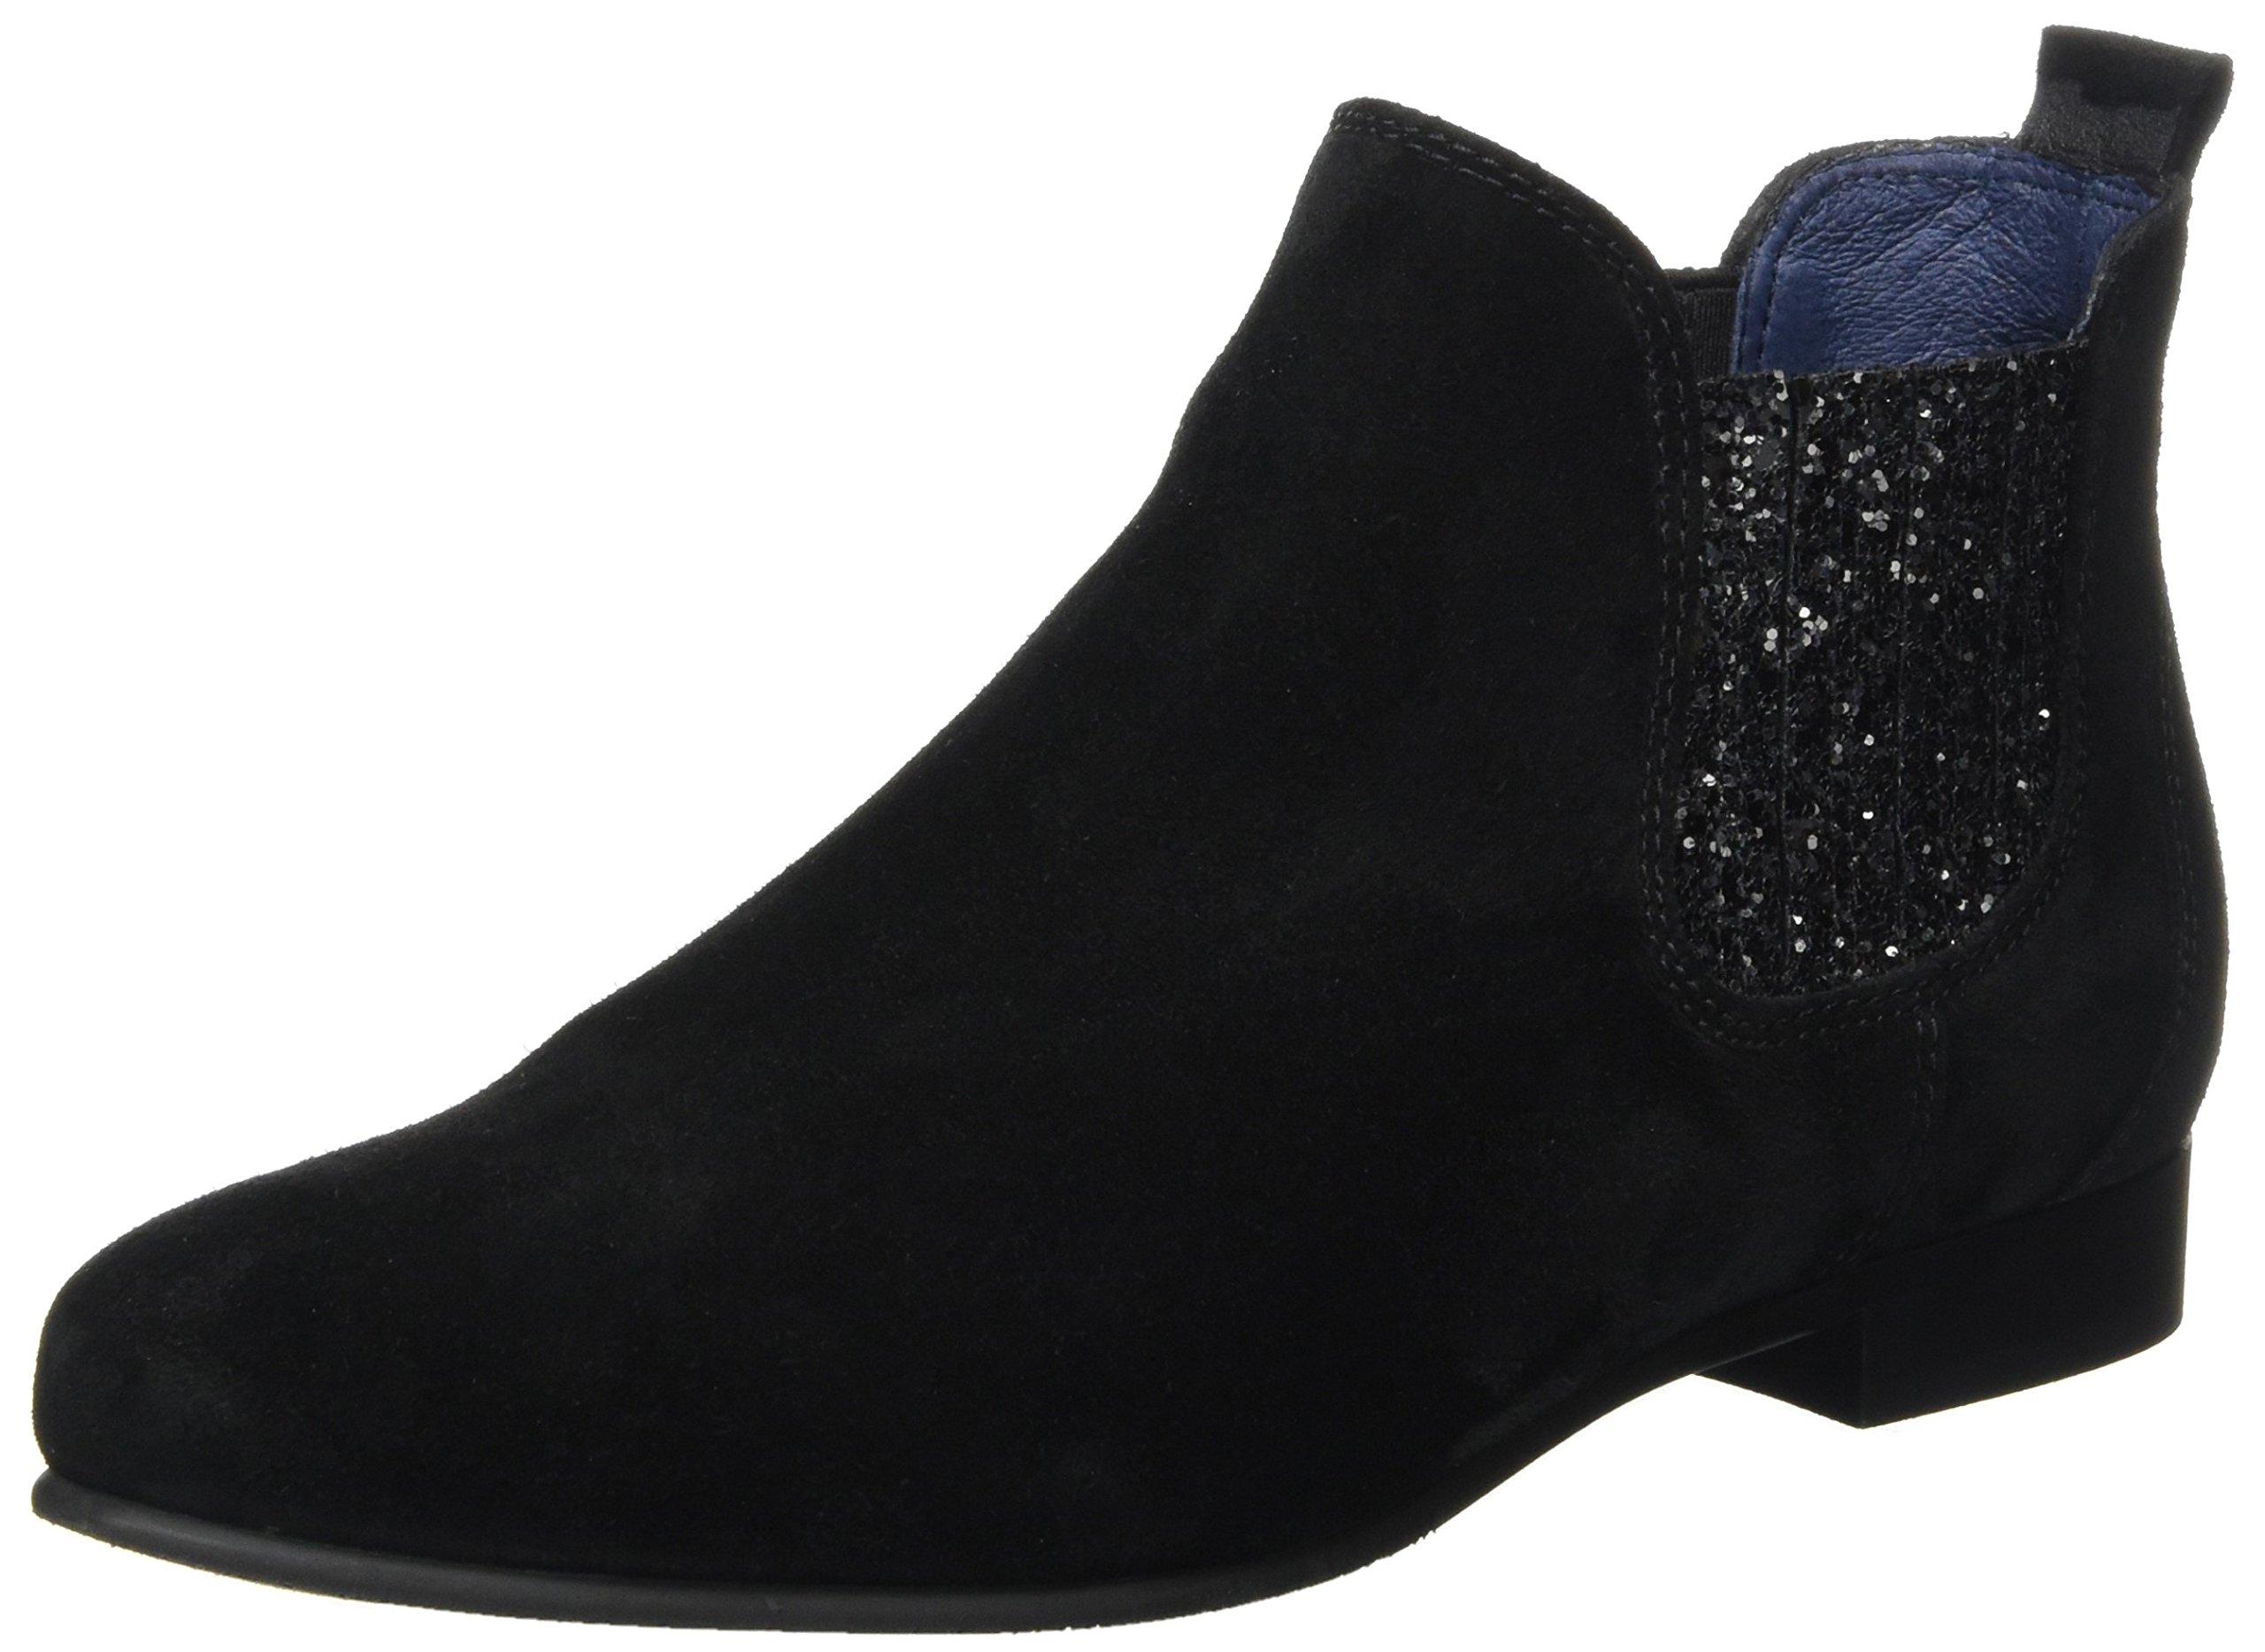 Eu Pinto Di Blu 0139 Boots AliceChelsea FemmeNoirblack qSUpMVzLG